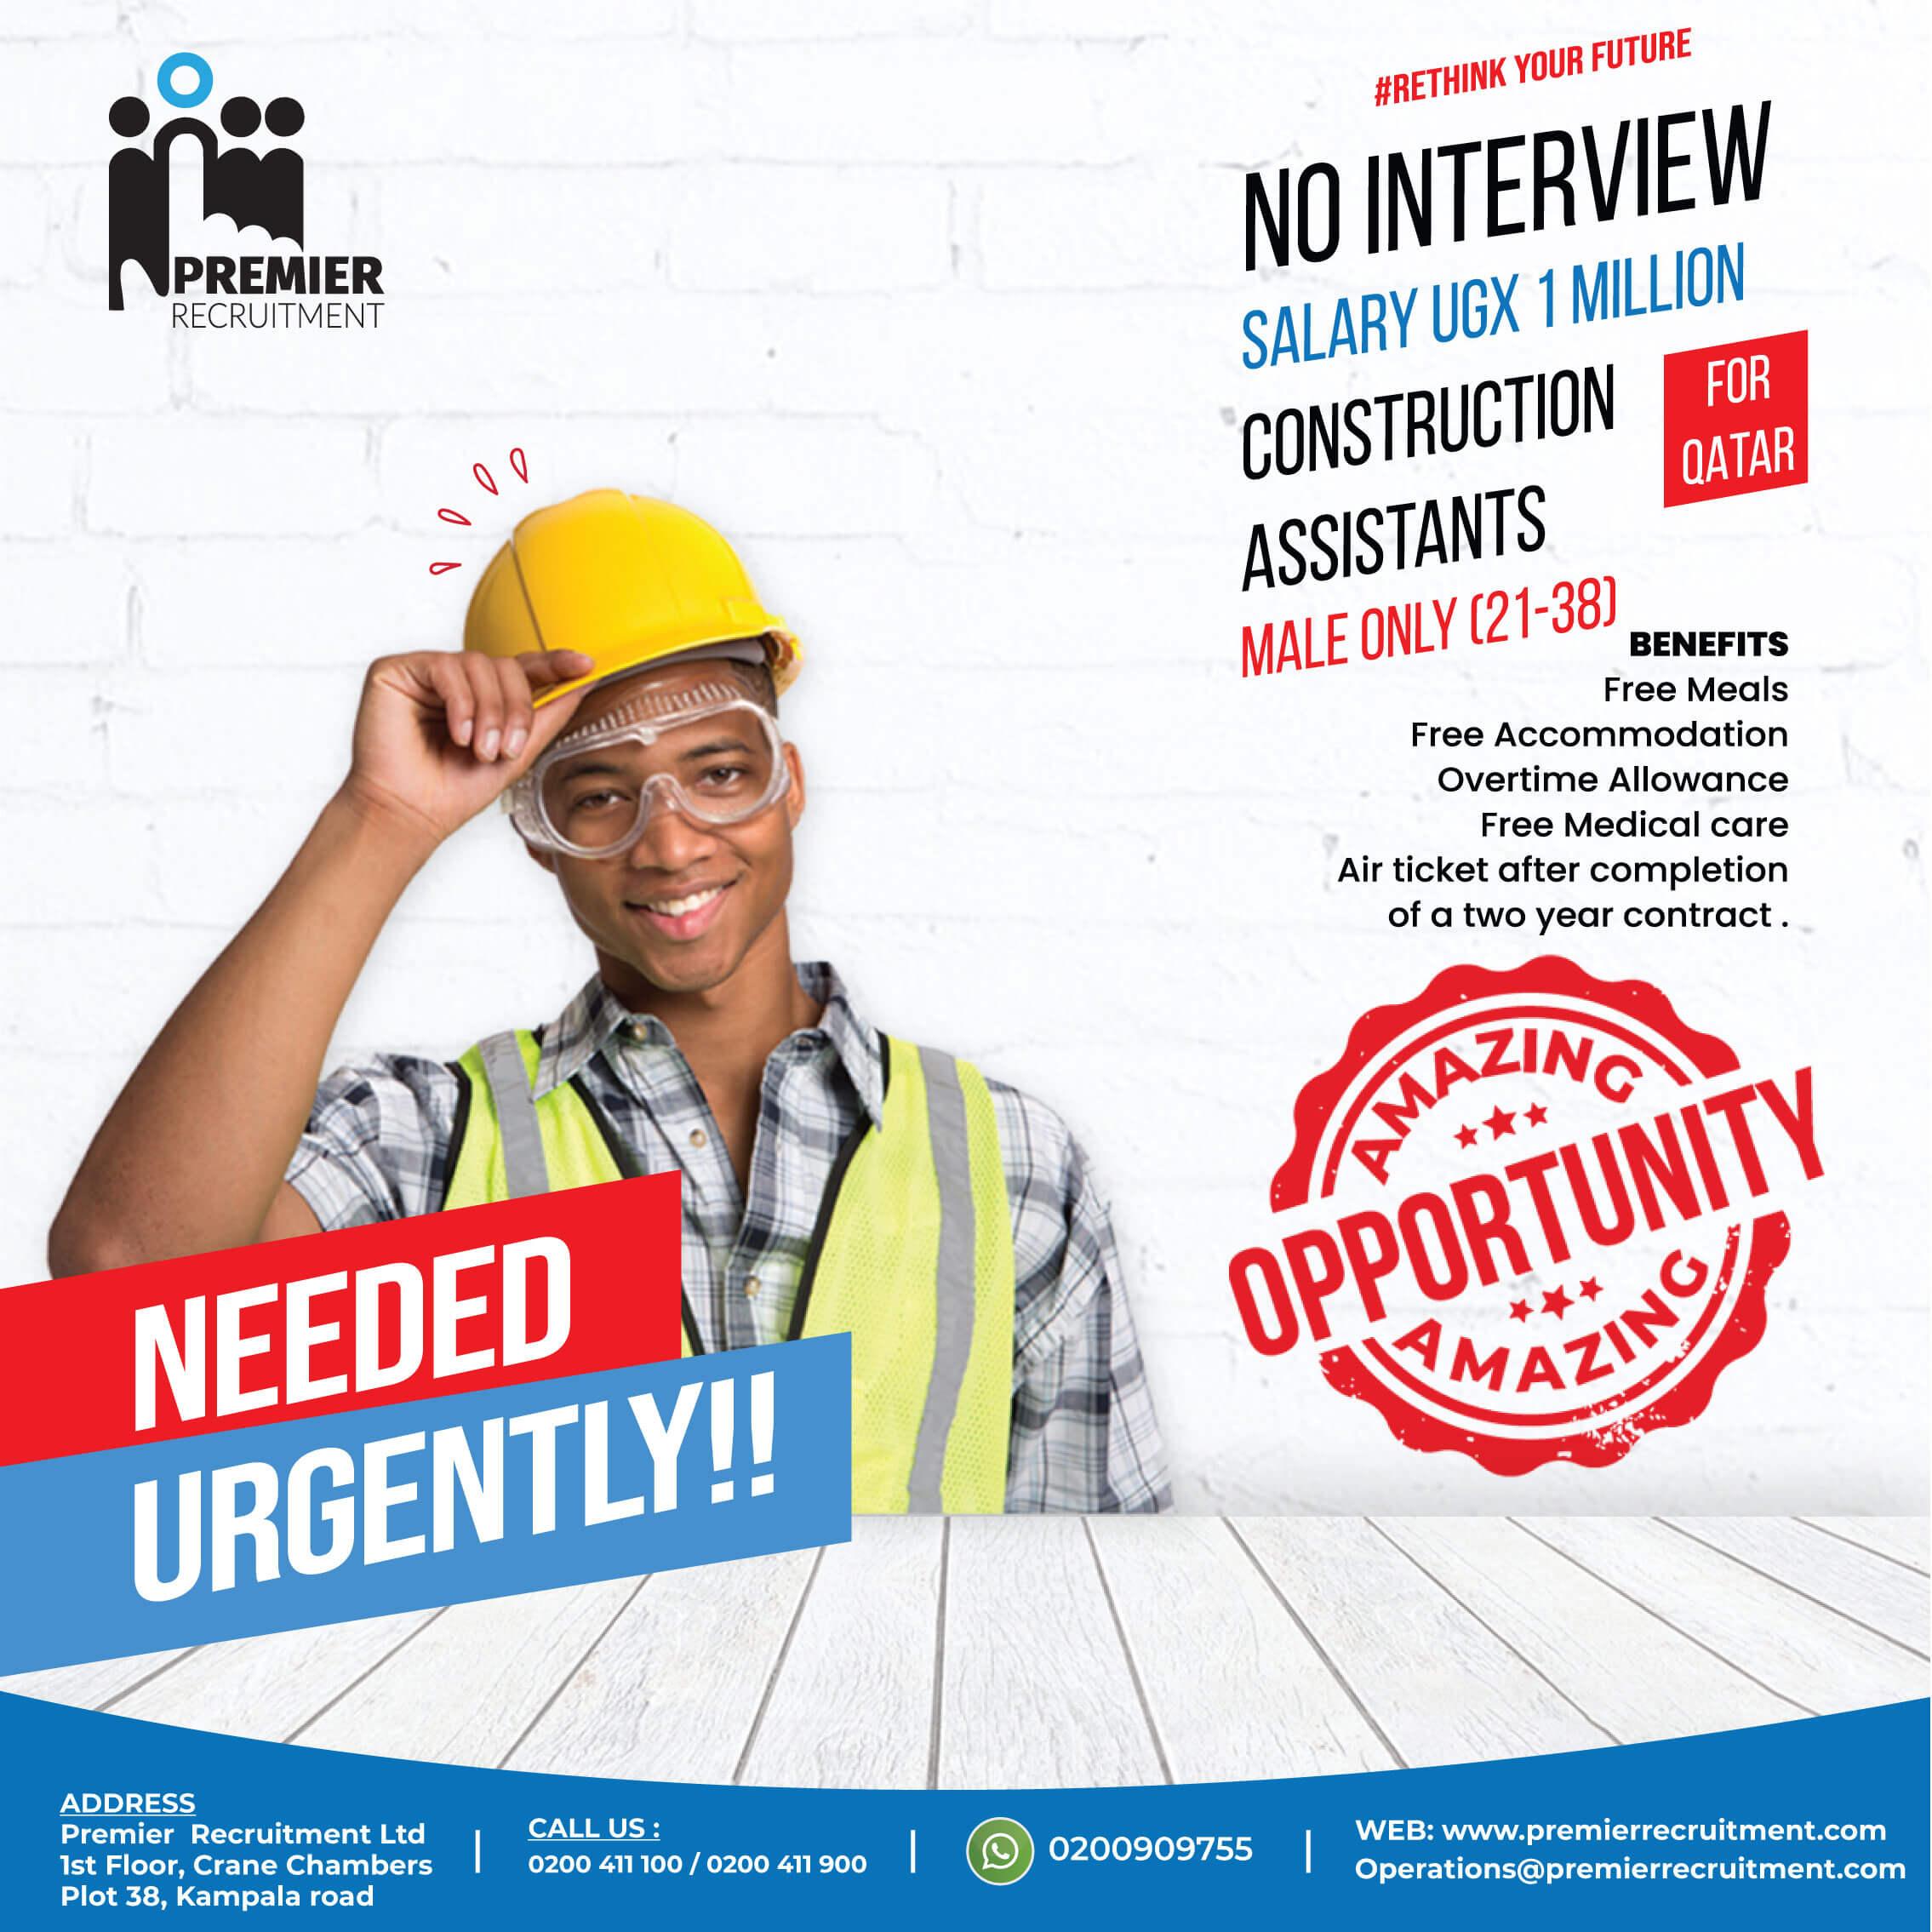 Premier Recruitment